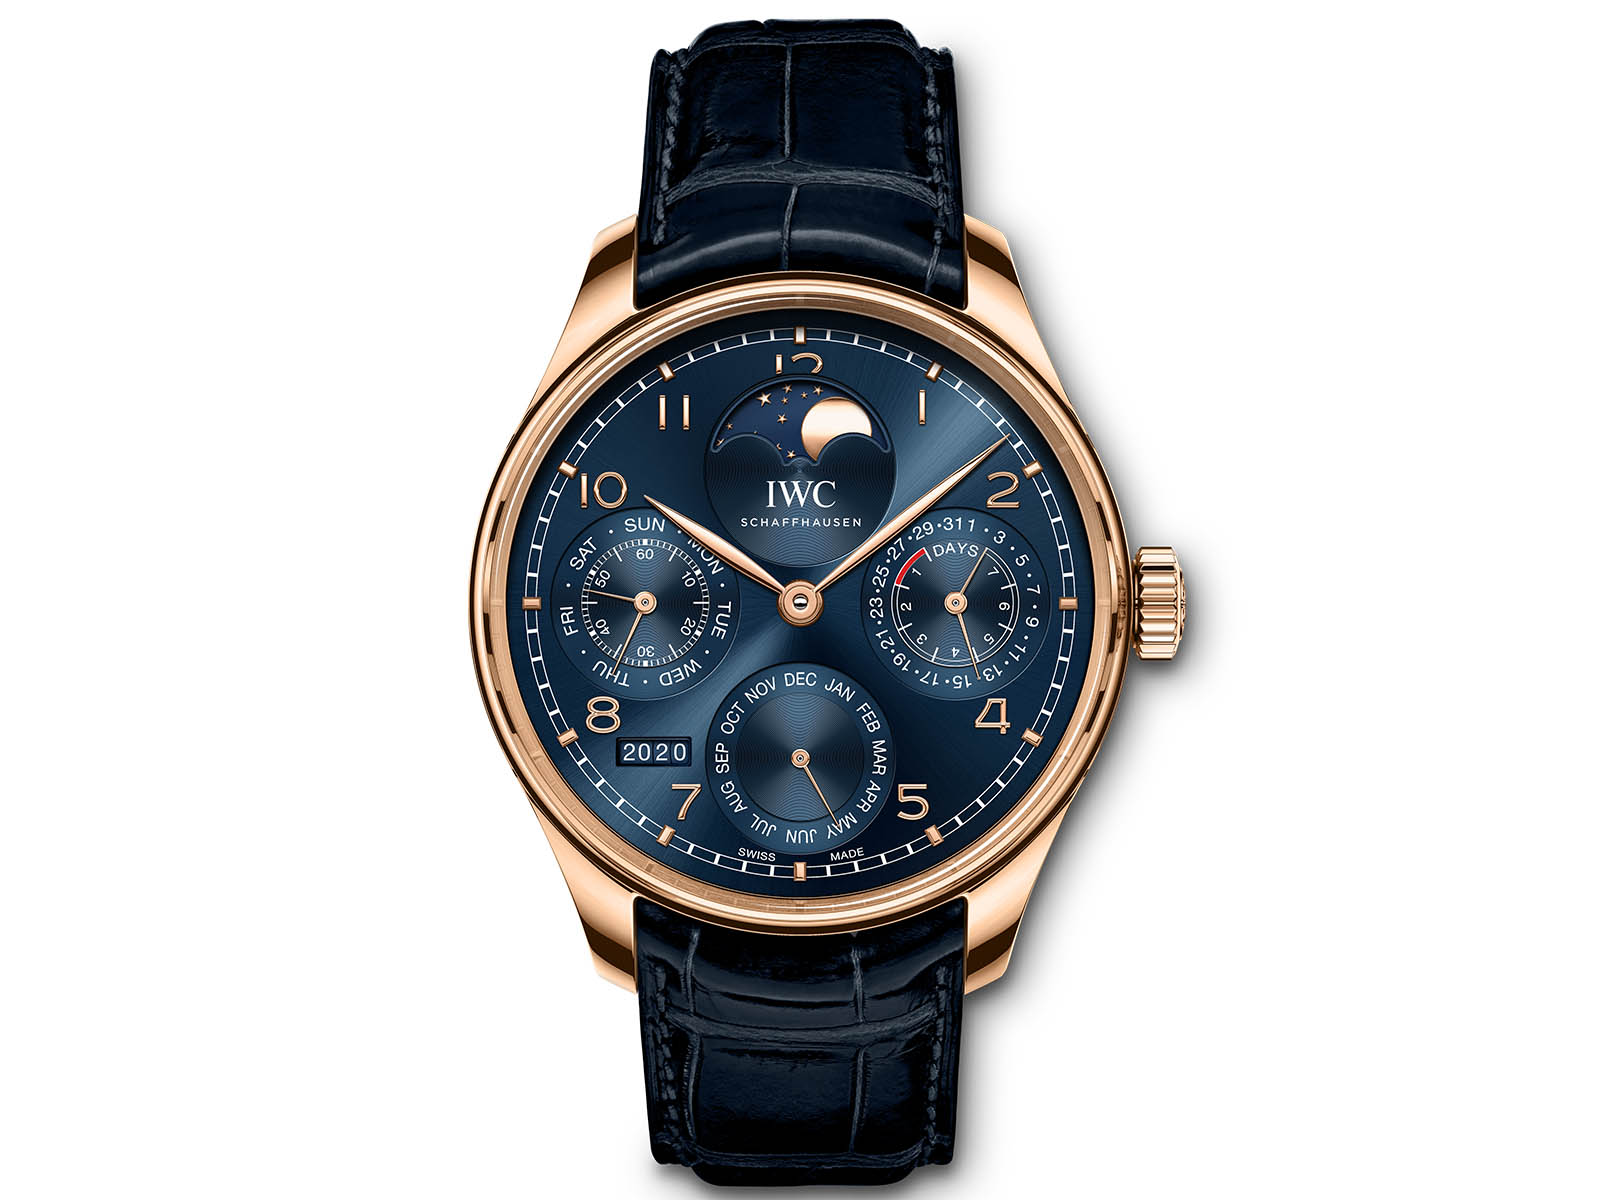 iw503312-iwc-schaffhausen-portugieser-perpetual-calendar-42-watches-wonders-2020-1.jpg